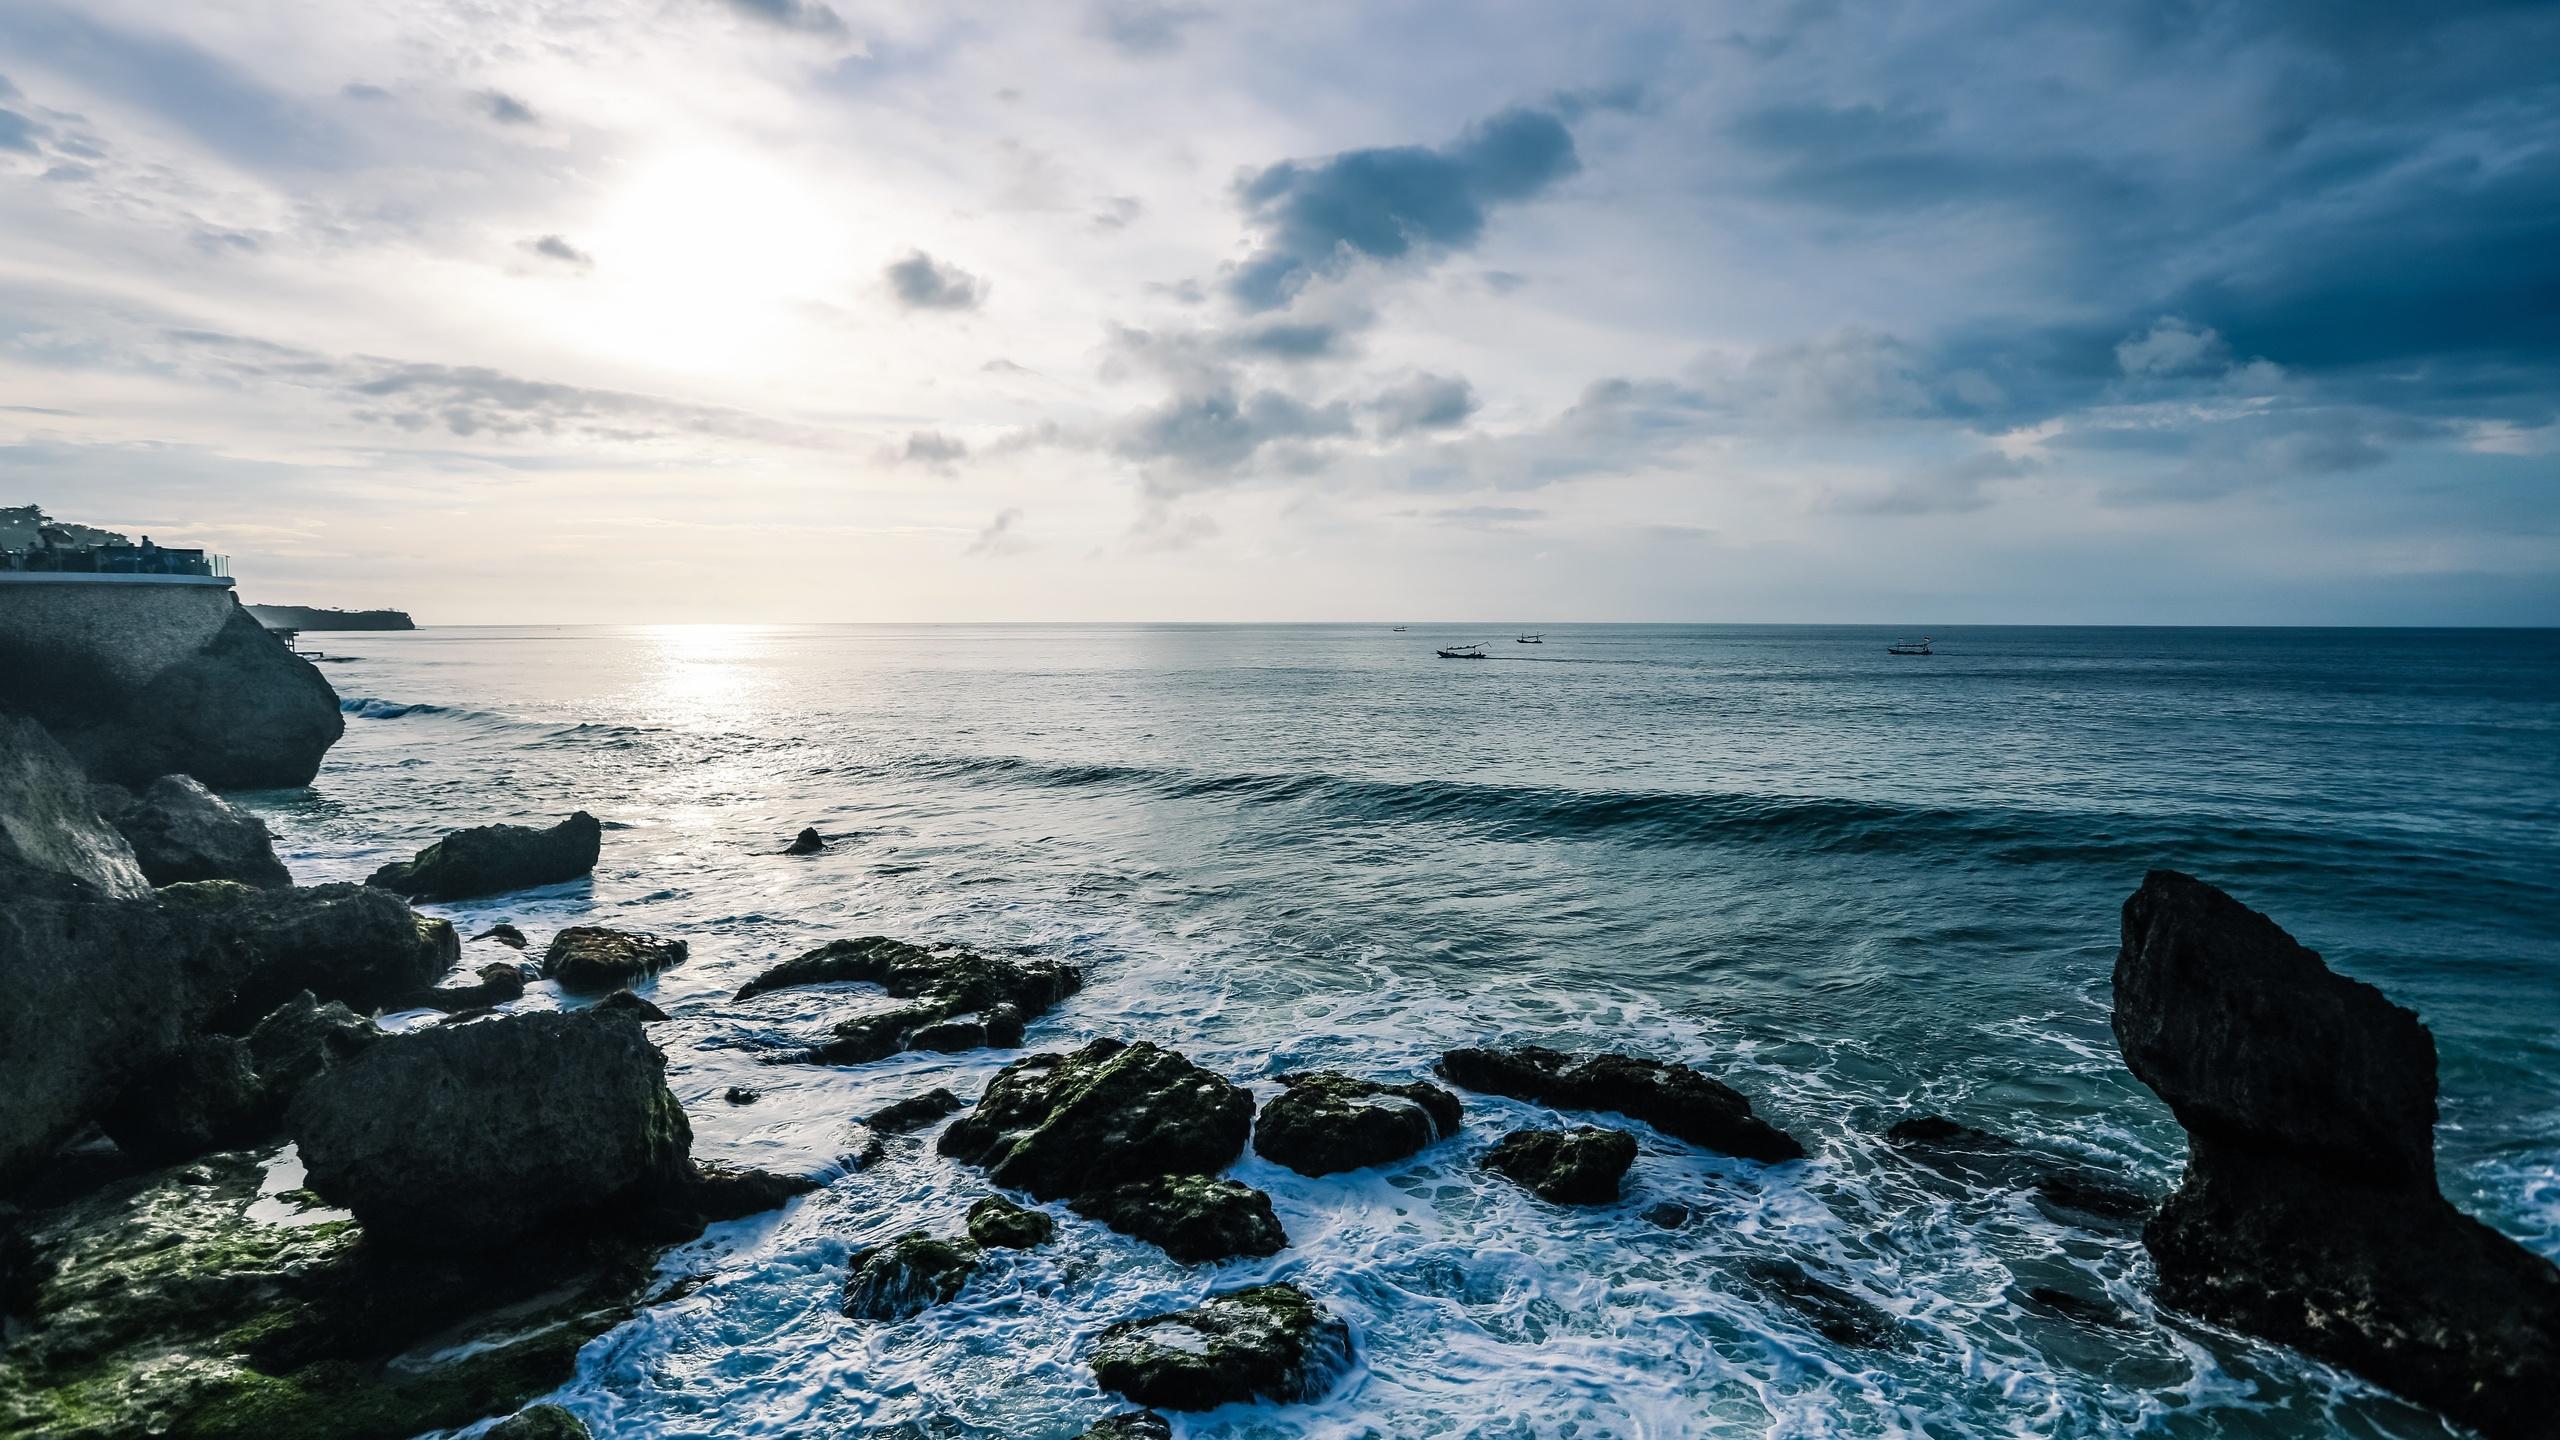 море, камень, пляж, океан